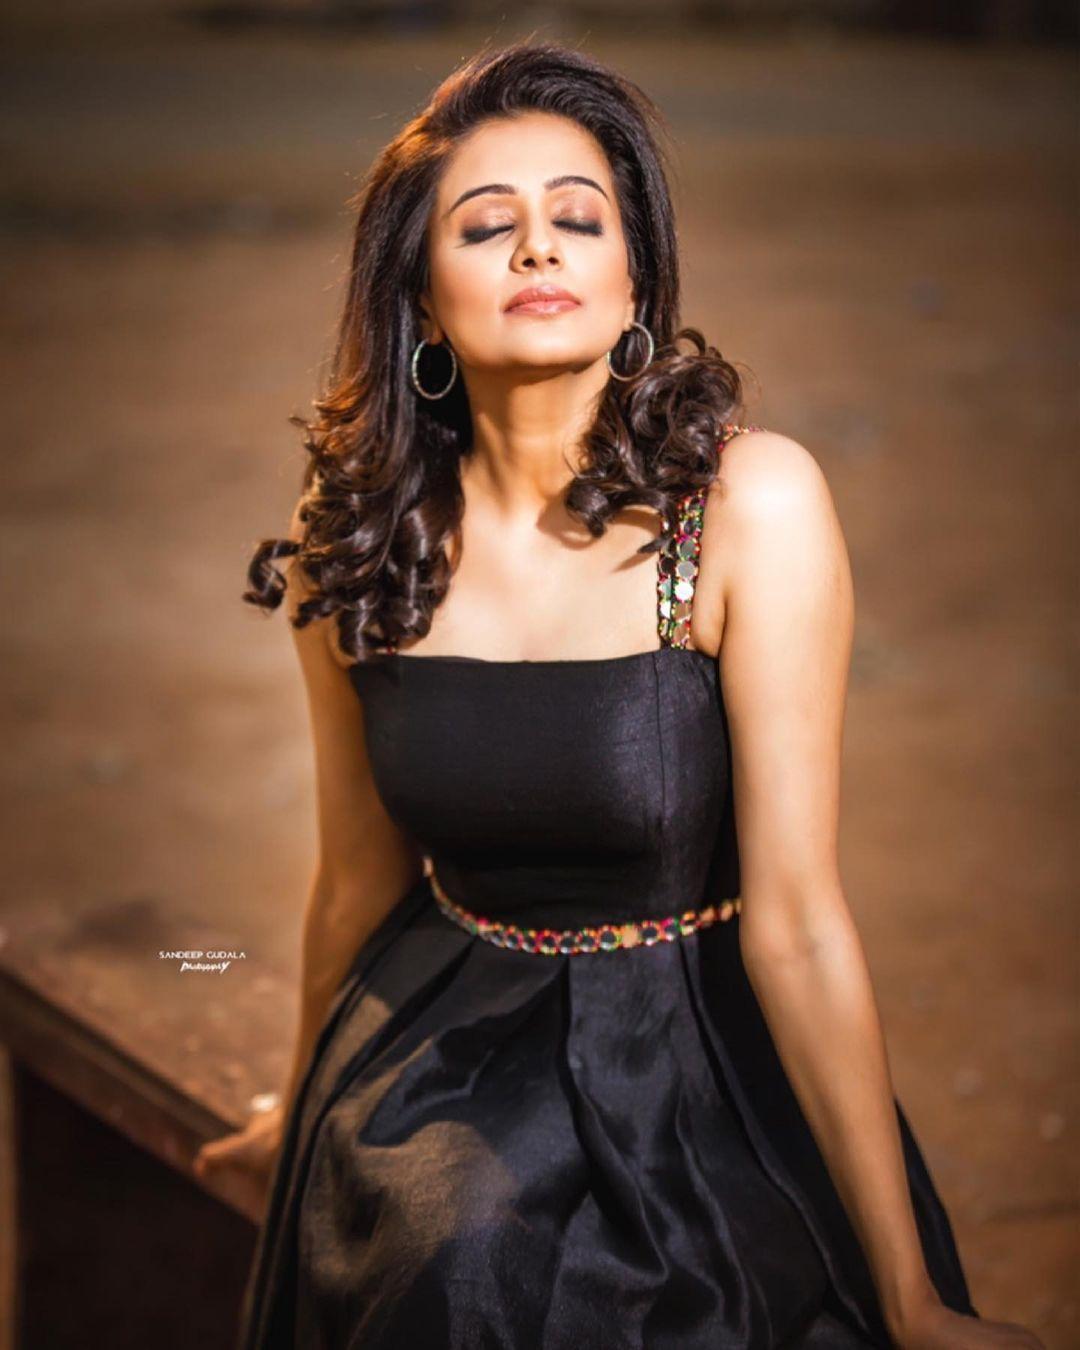 South Indian Actress Priyamani Looking Hot in Black Dress